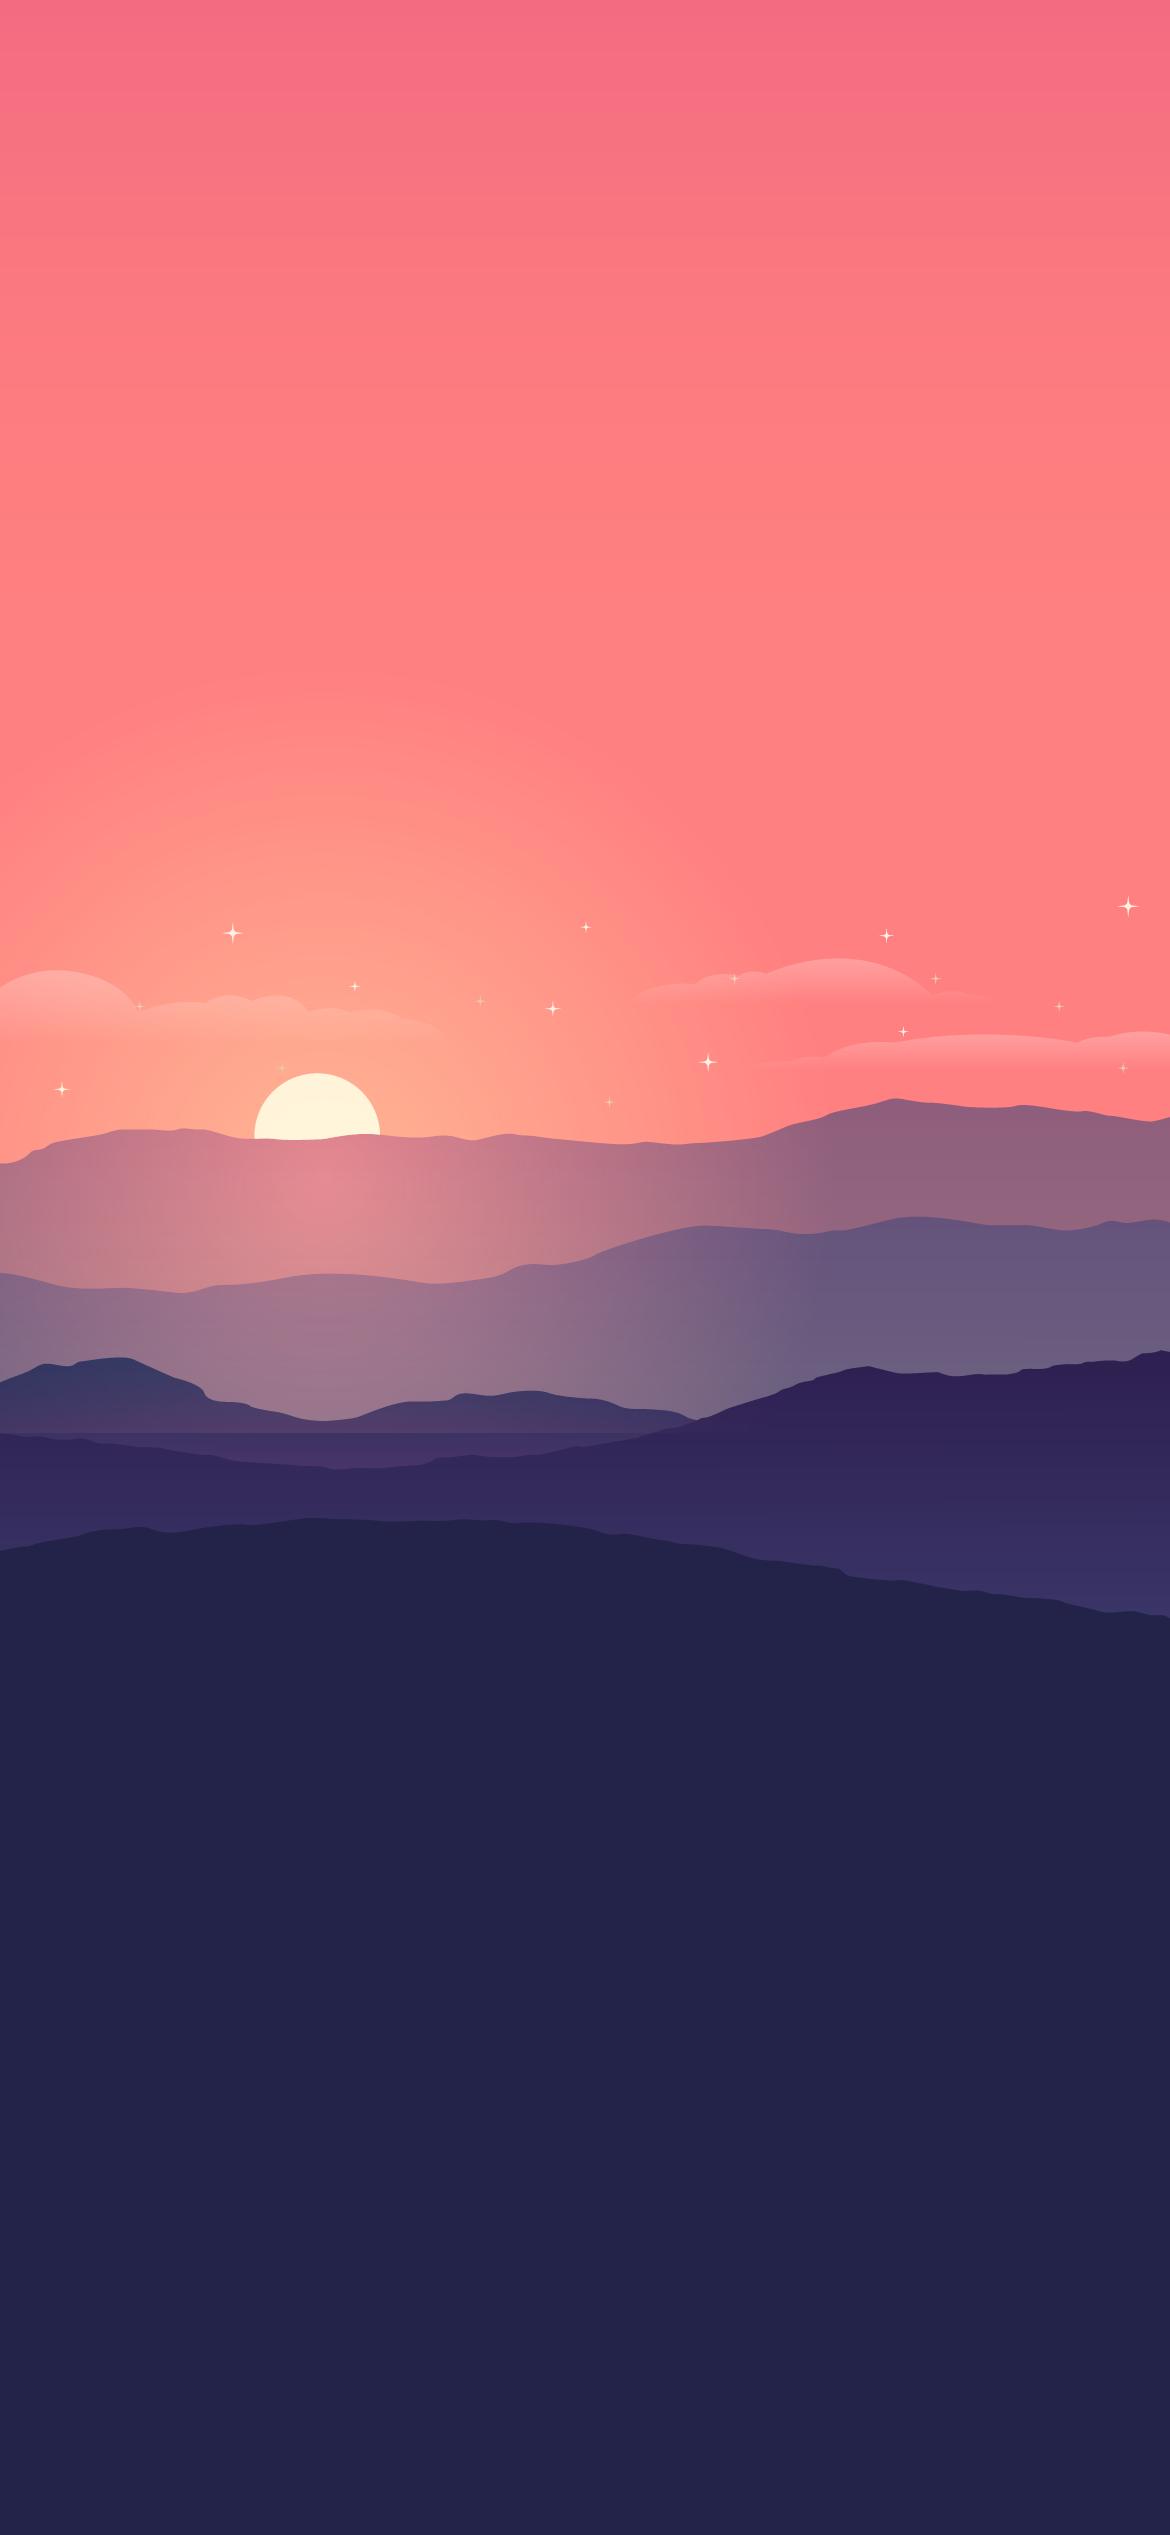 SUNSET LANDSCAPE SUN COOL MINIMAL